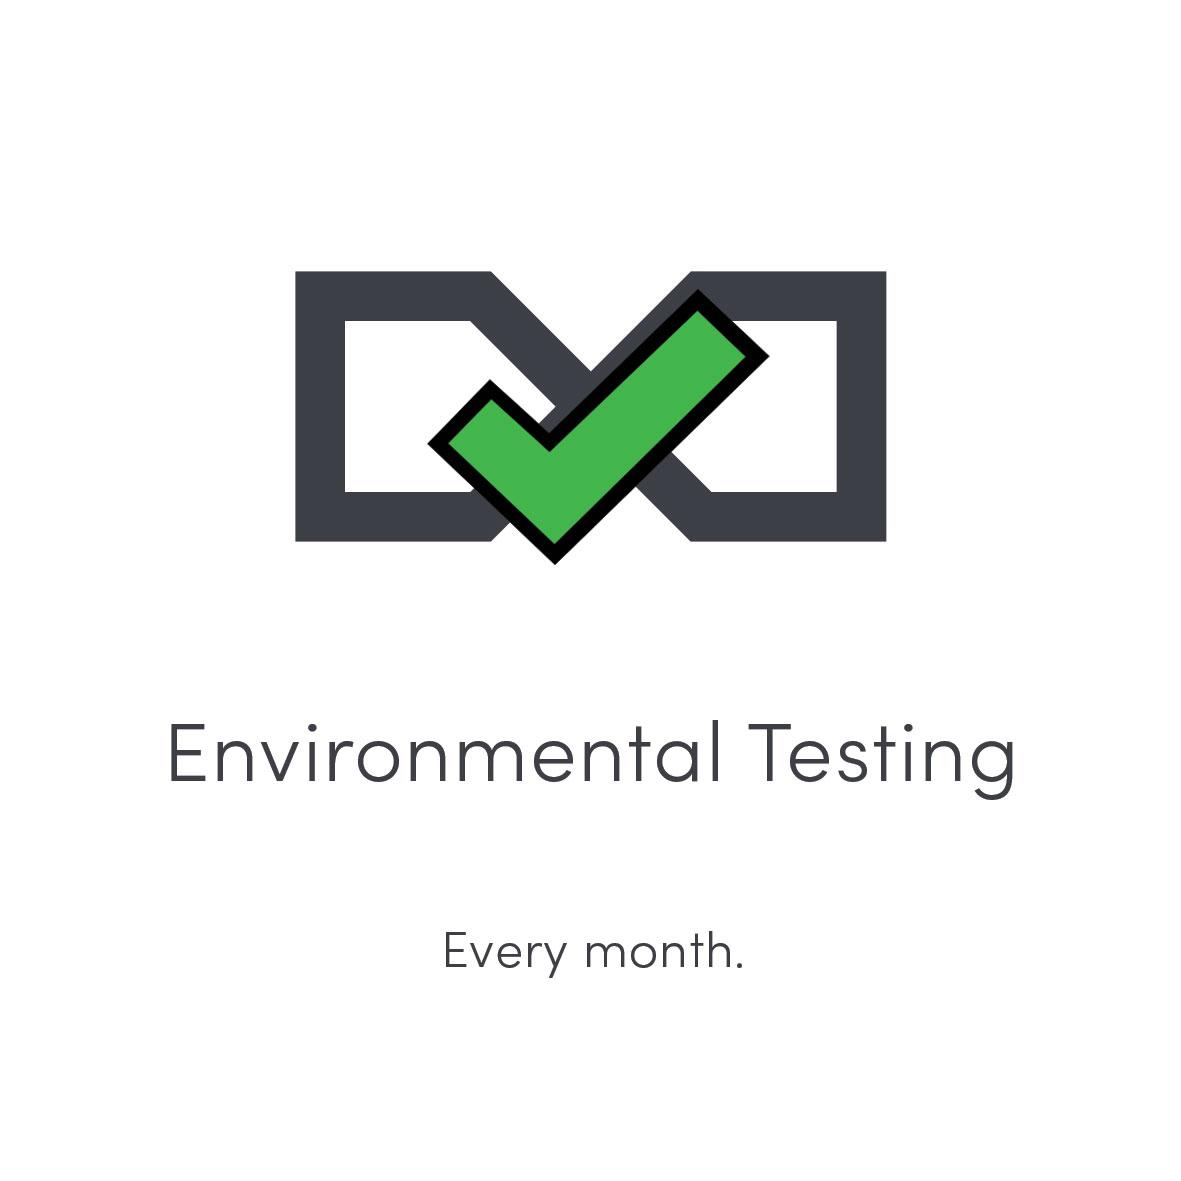 INFINIRTY_WELLNESS_GROUP_Environmental_Testing.jpg